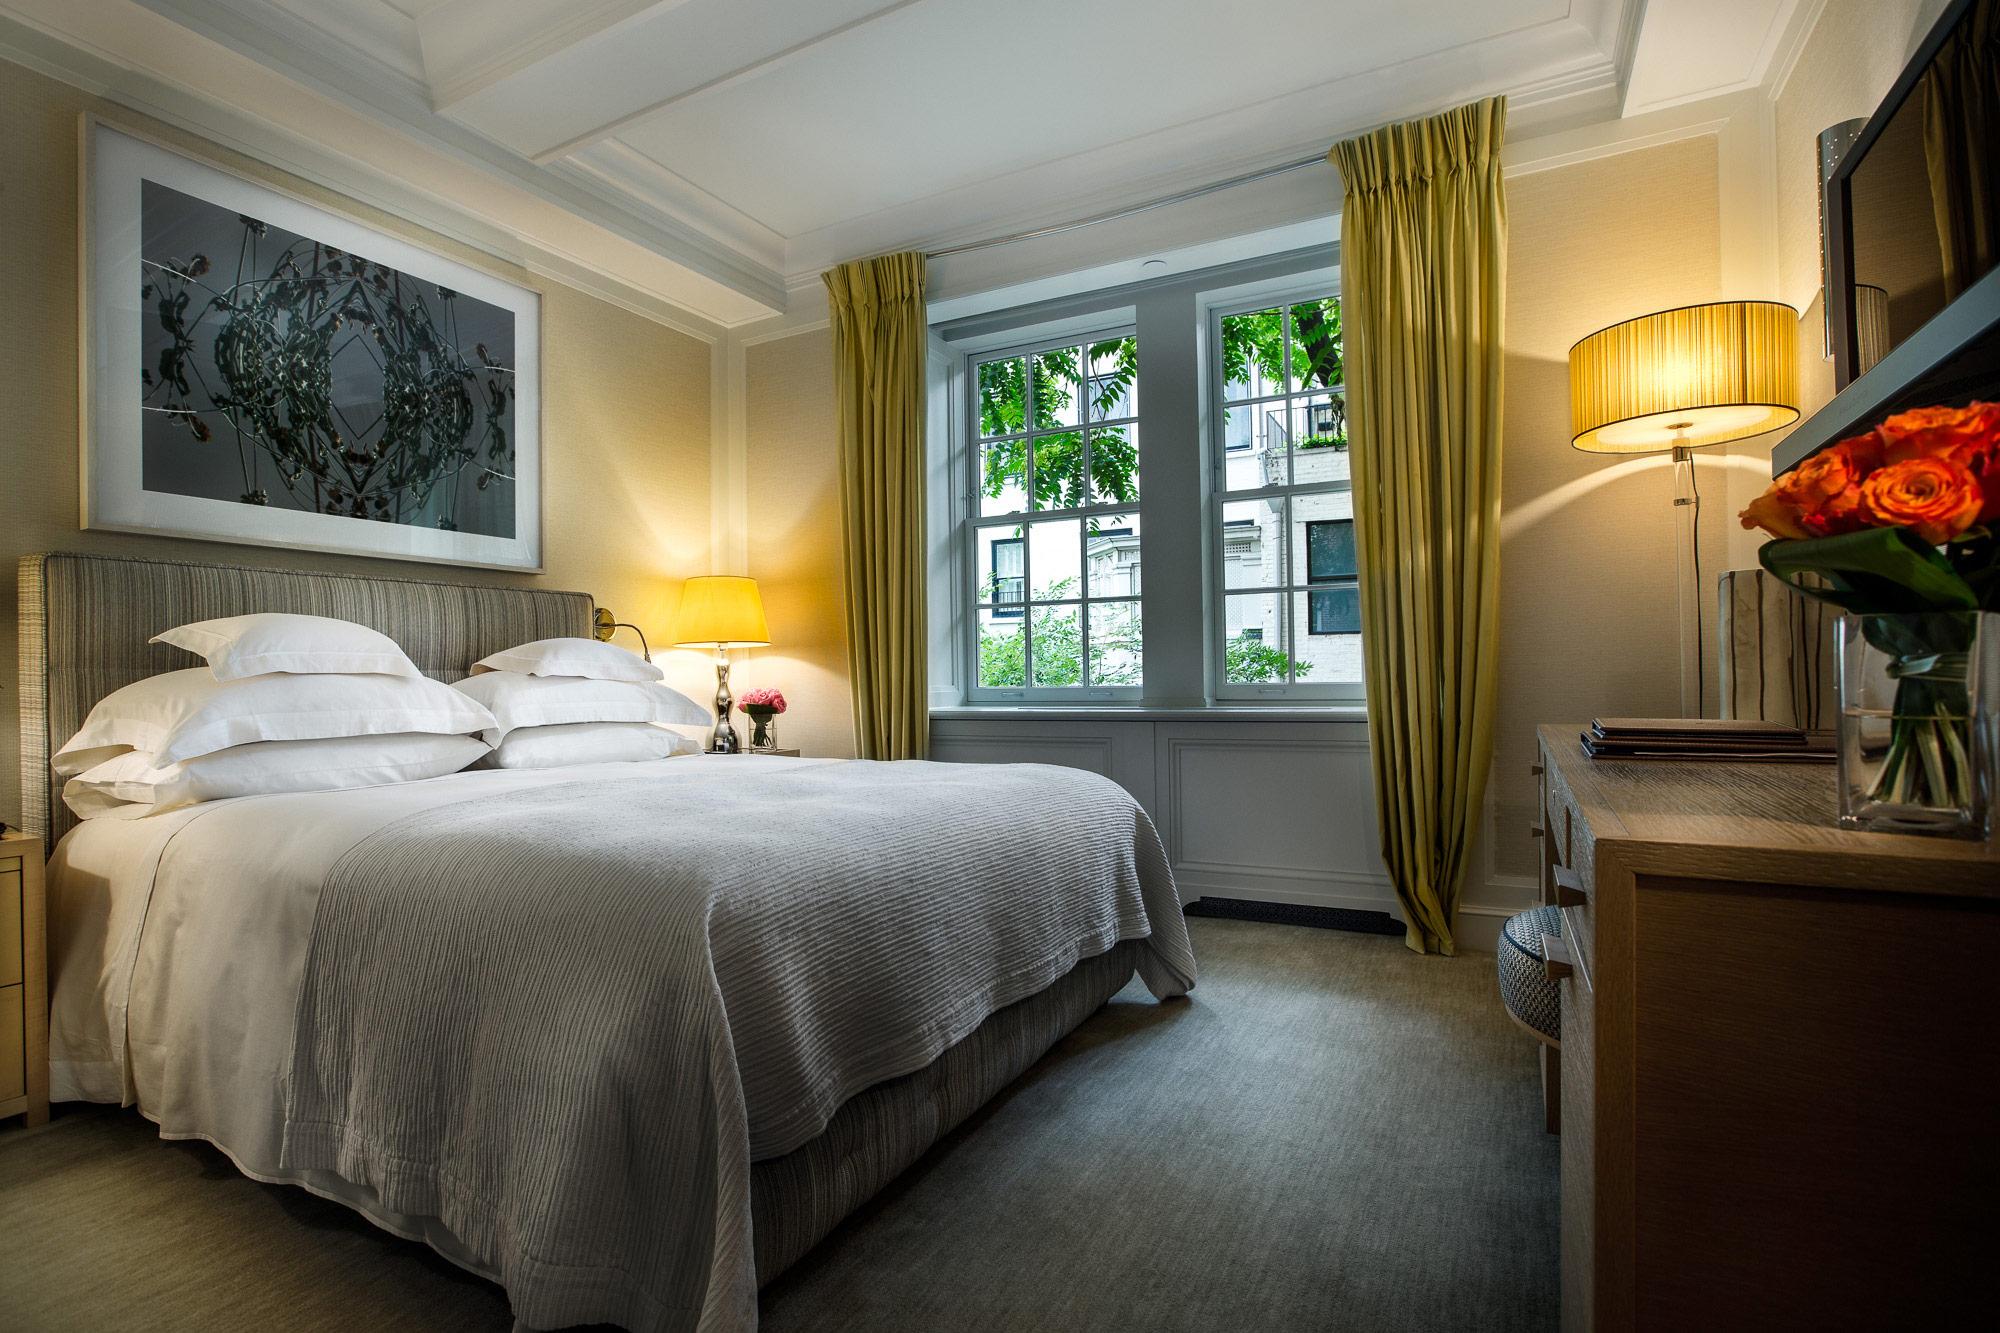 Superior Courtyard Queen 1 Bedroom Luxury Townhouse The